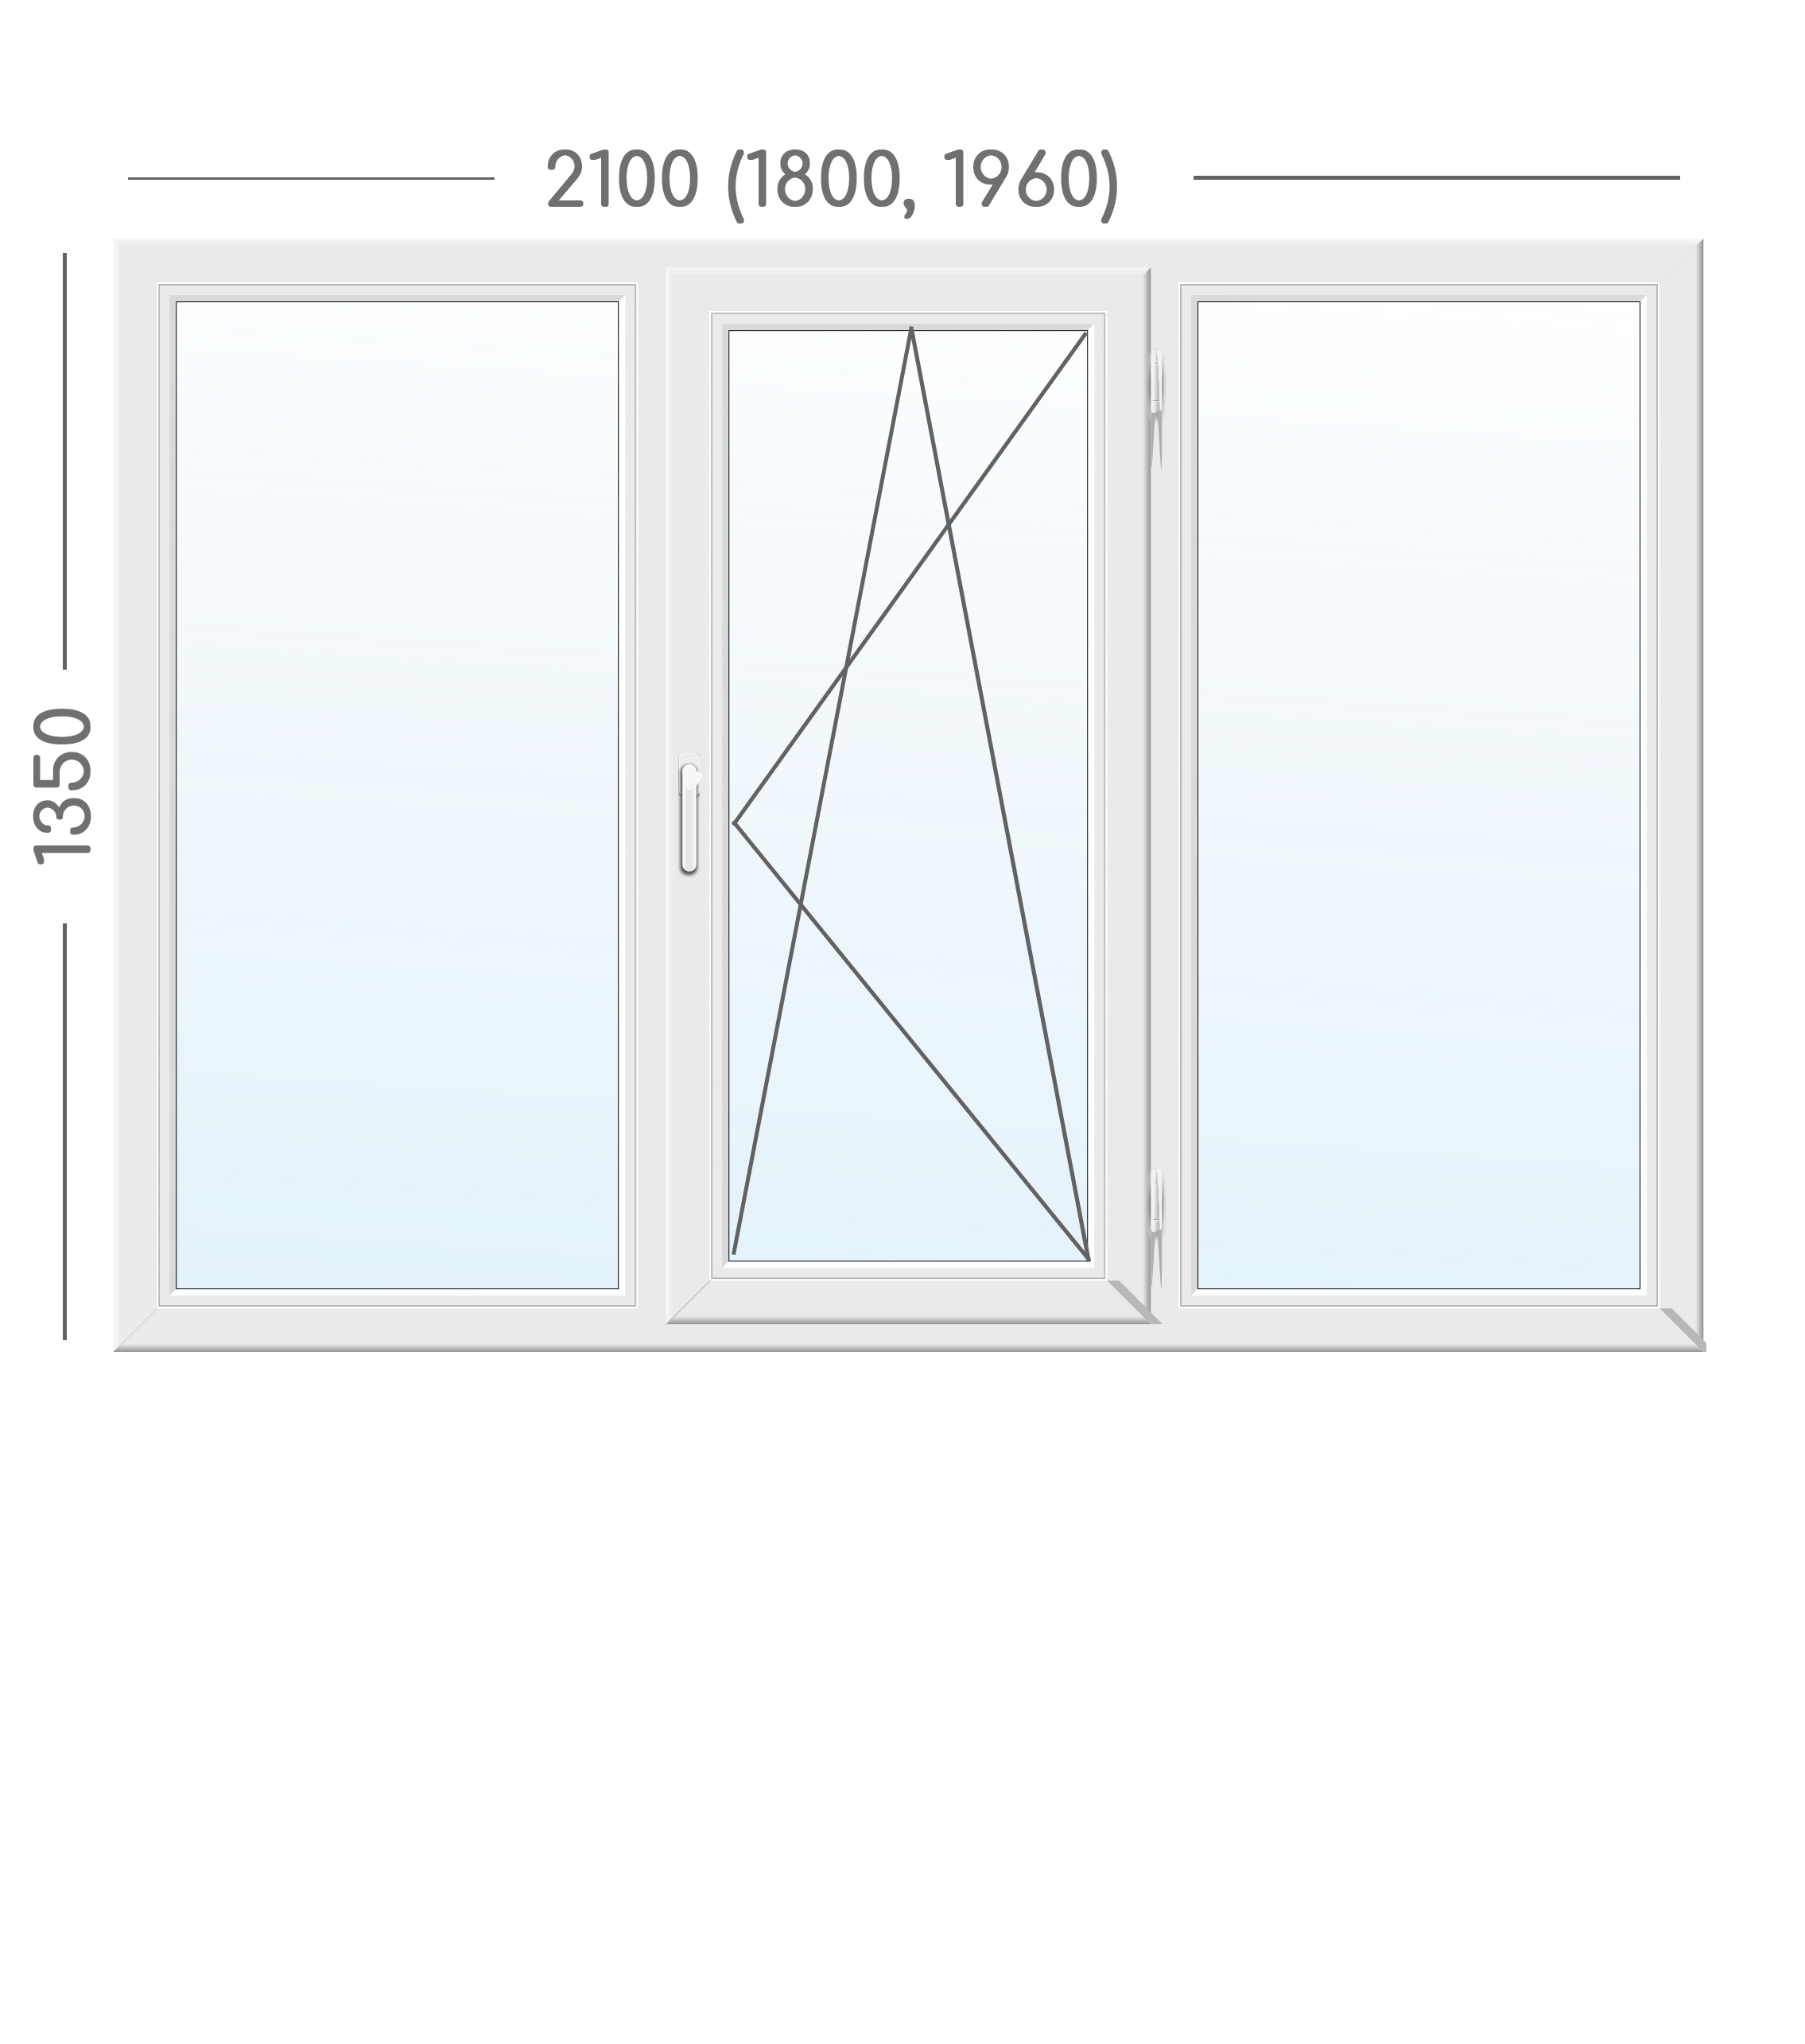 Окно Winbau Optimum с фурнитурой ROTO (Германия)